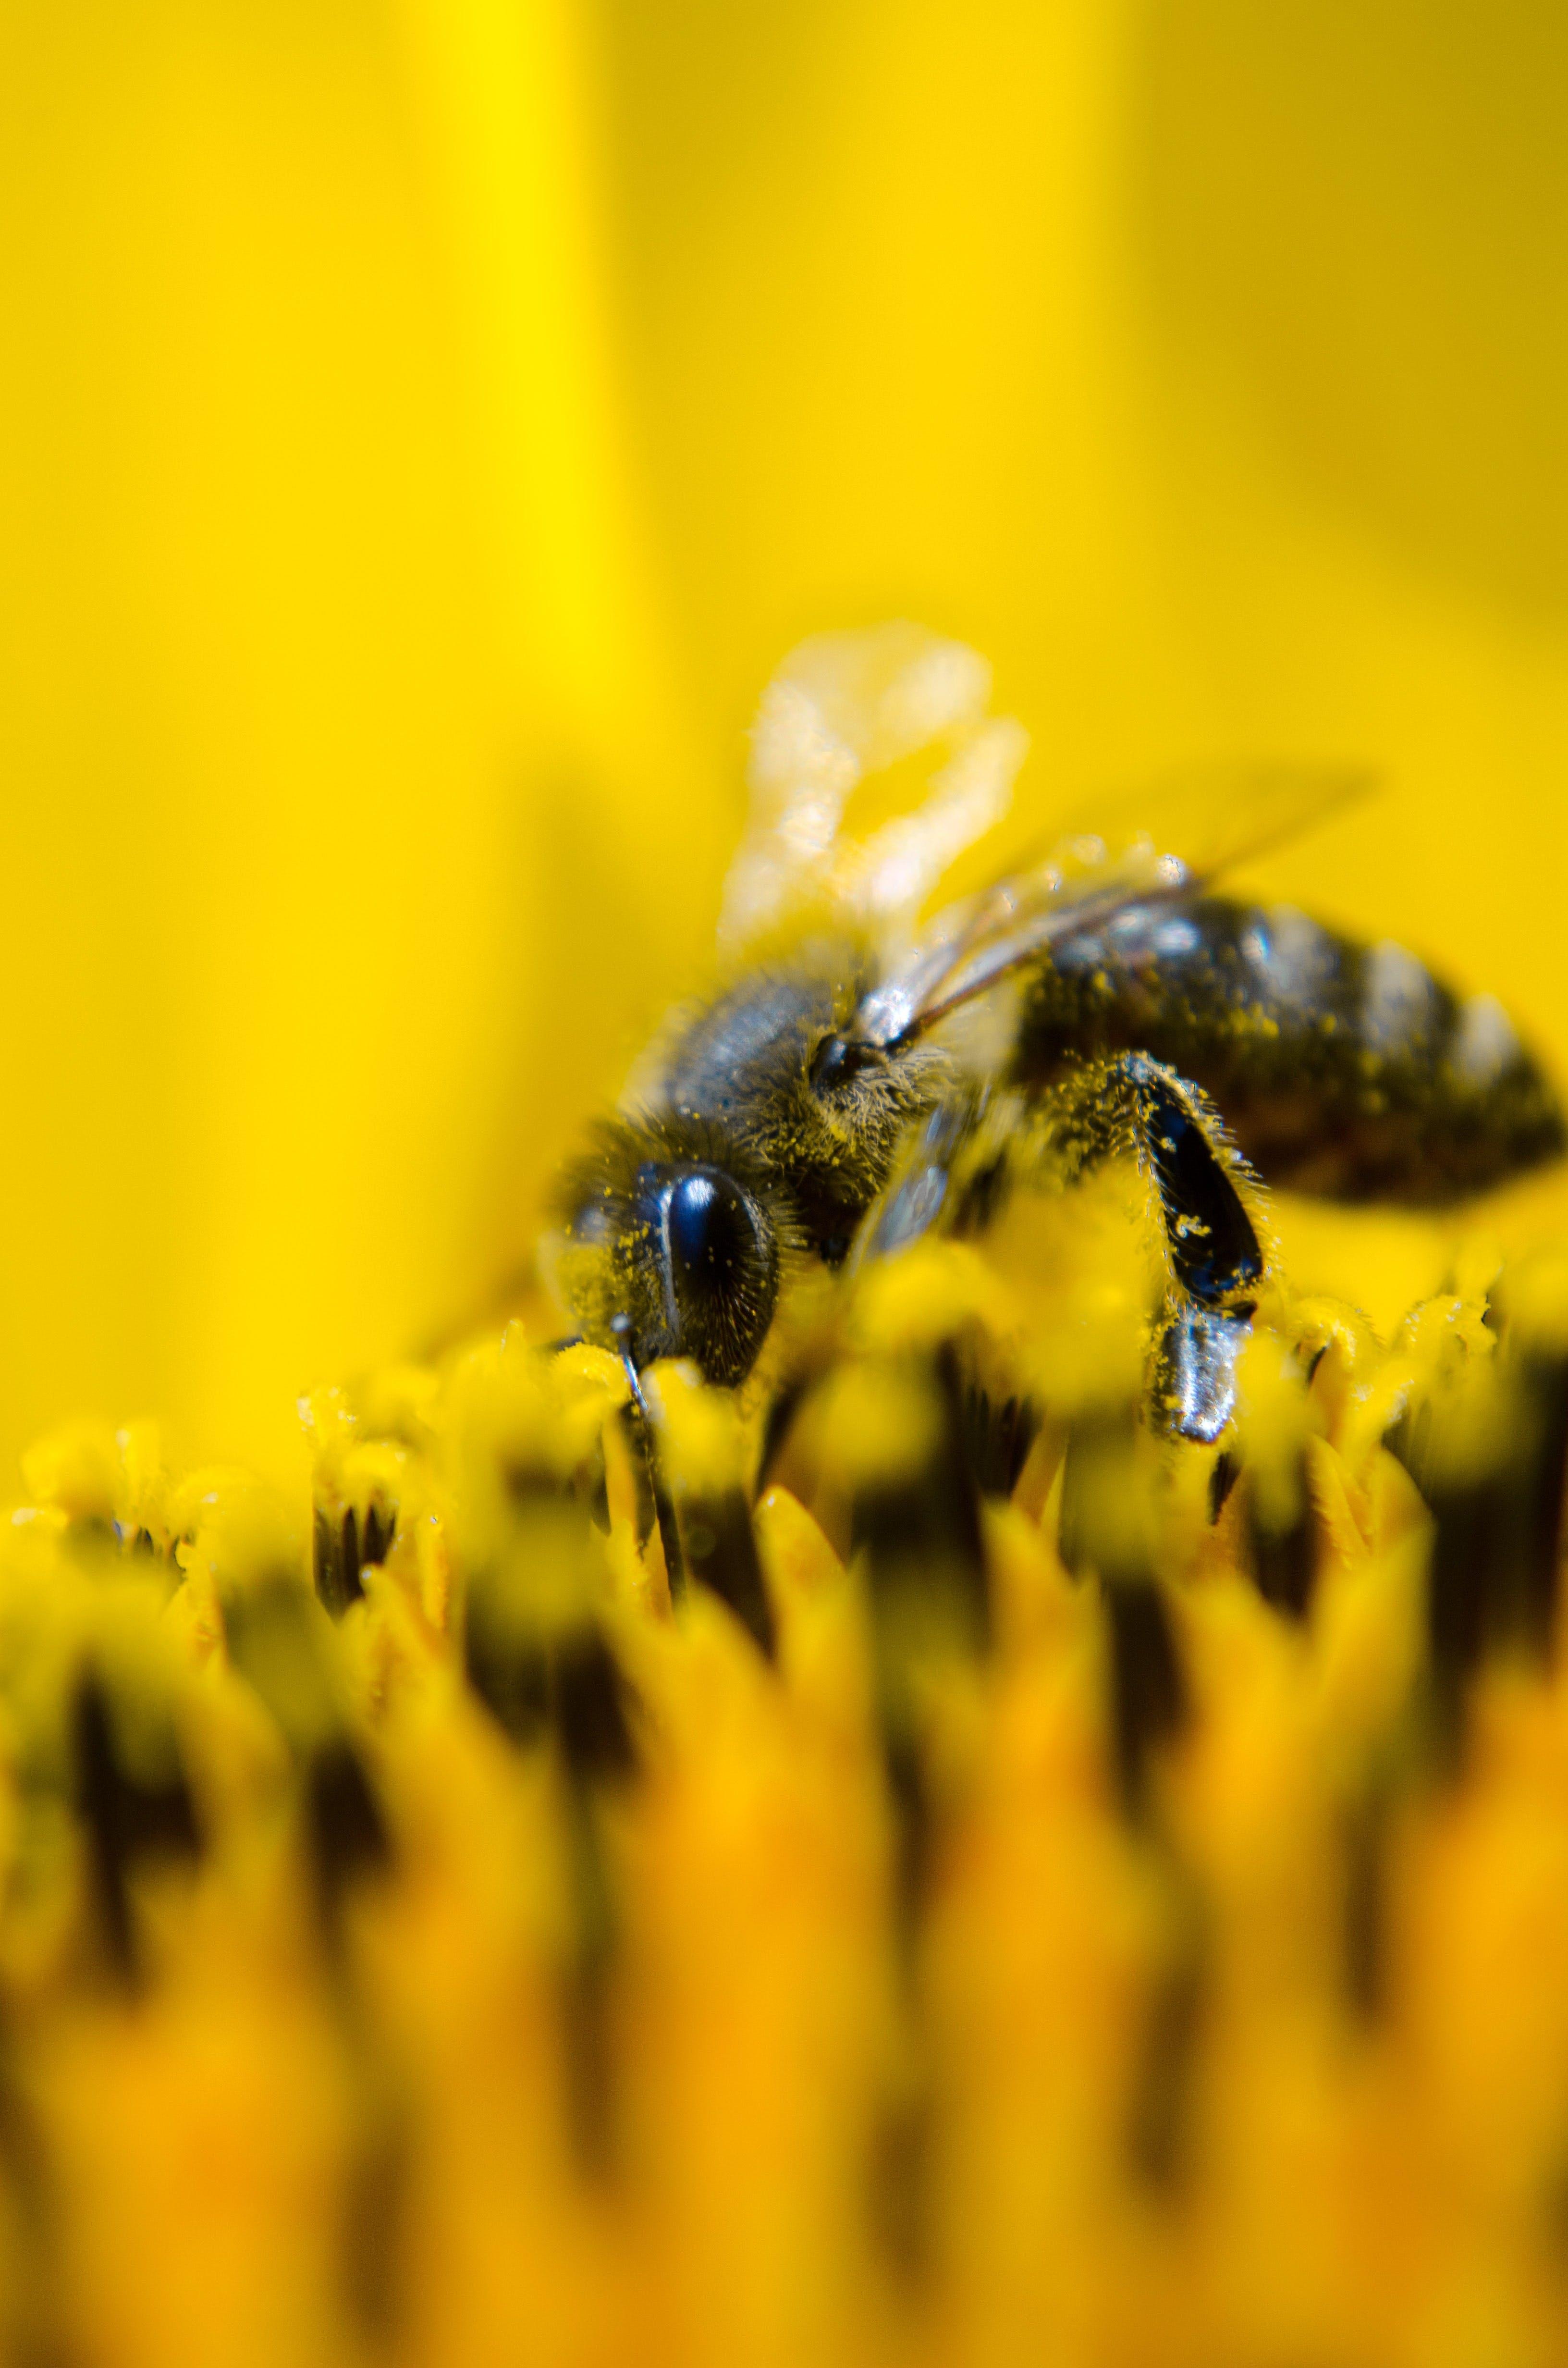 Kostenloses Stock Foto zu bestäubung, biene, honigbiene, insekt